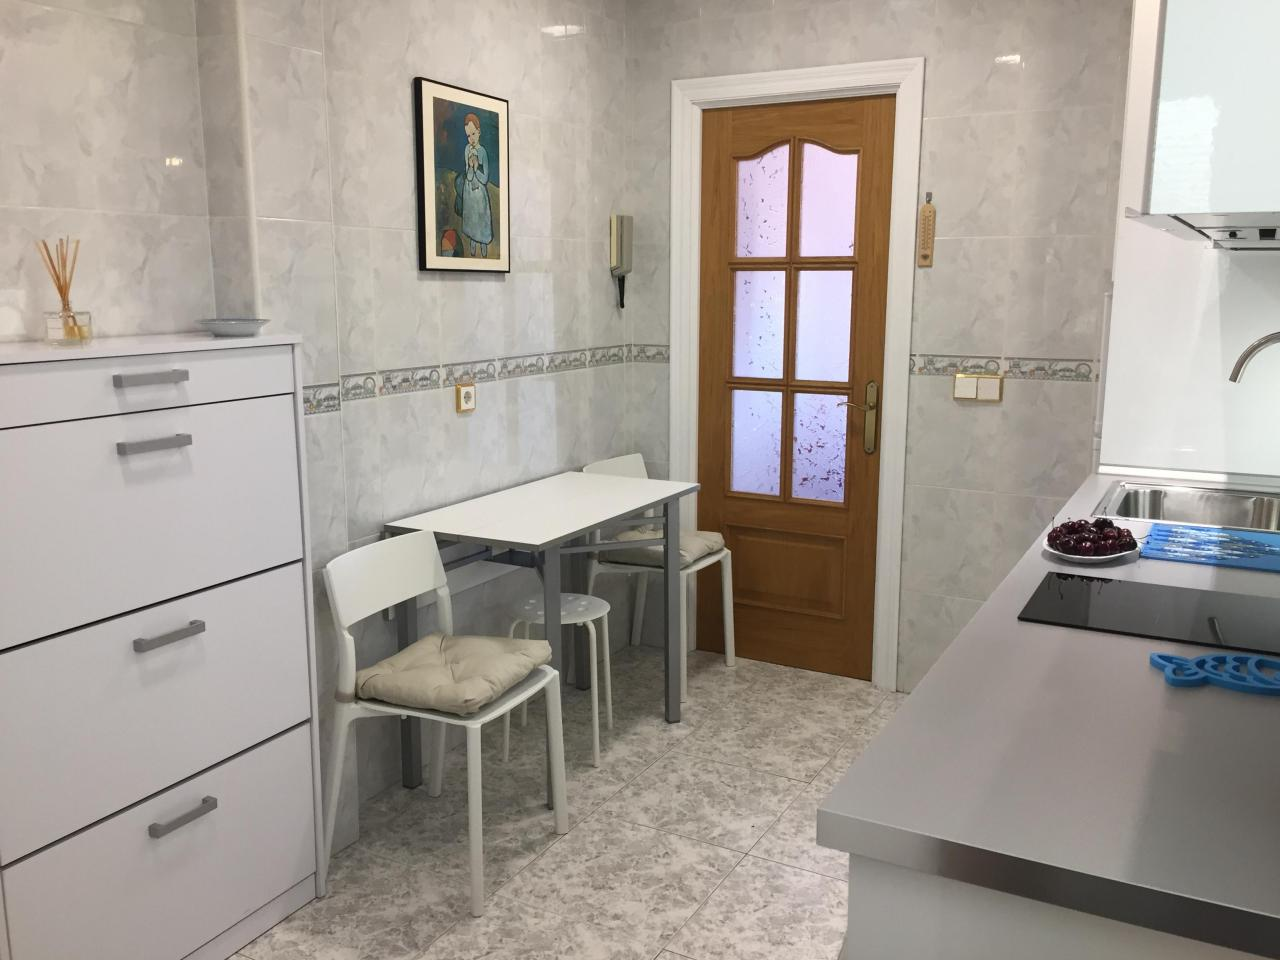 Apartamento barato para vacaciones San Sebastián, Guipúzcoa